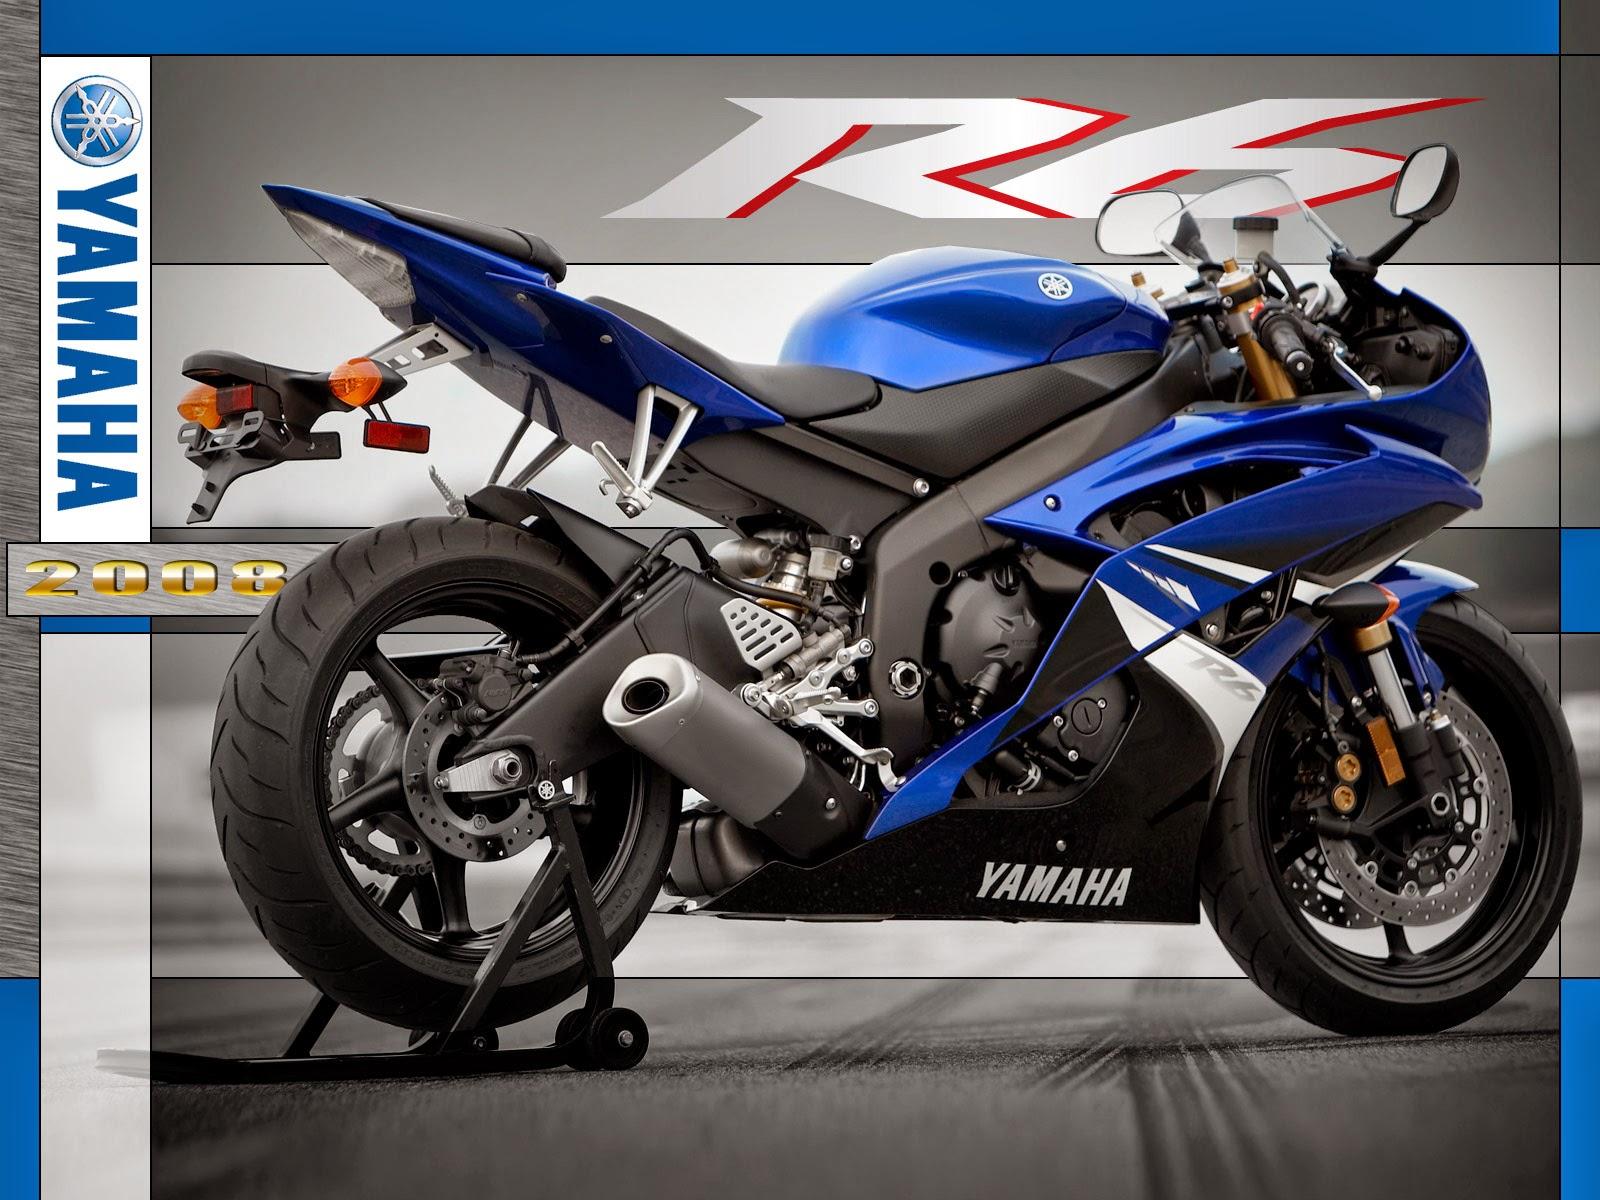 Harga Motor Bekas Yamaha Terbaru Juli 2014